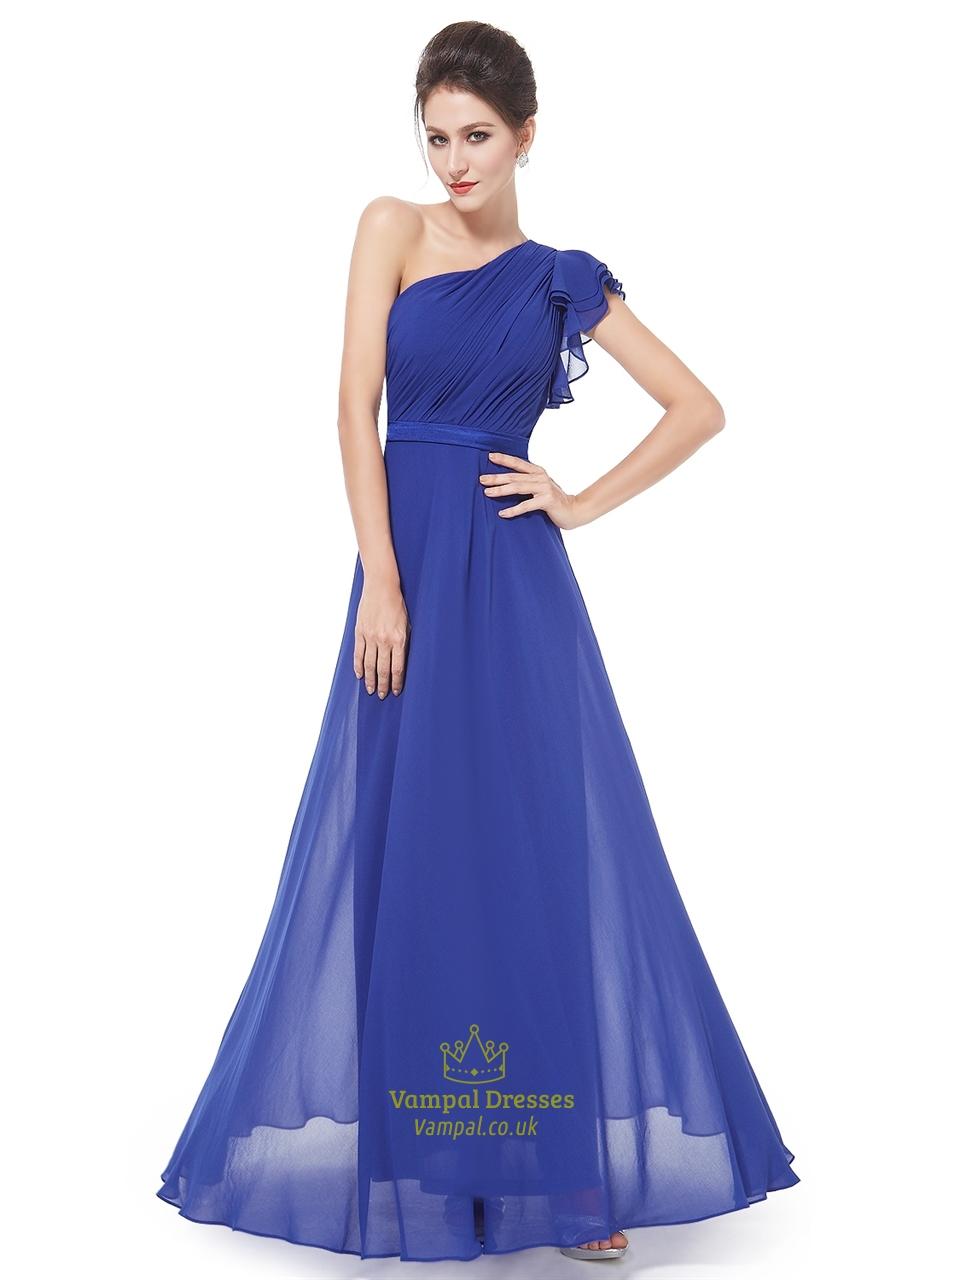 royal blue dresses for a wedding photo - 1